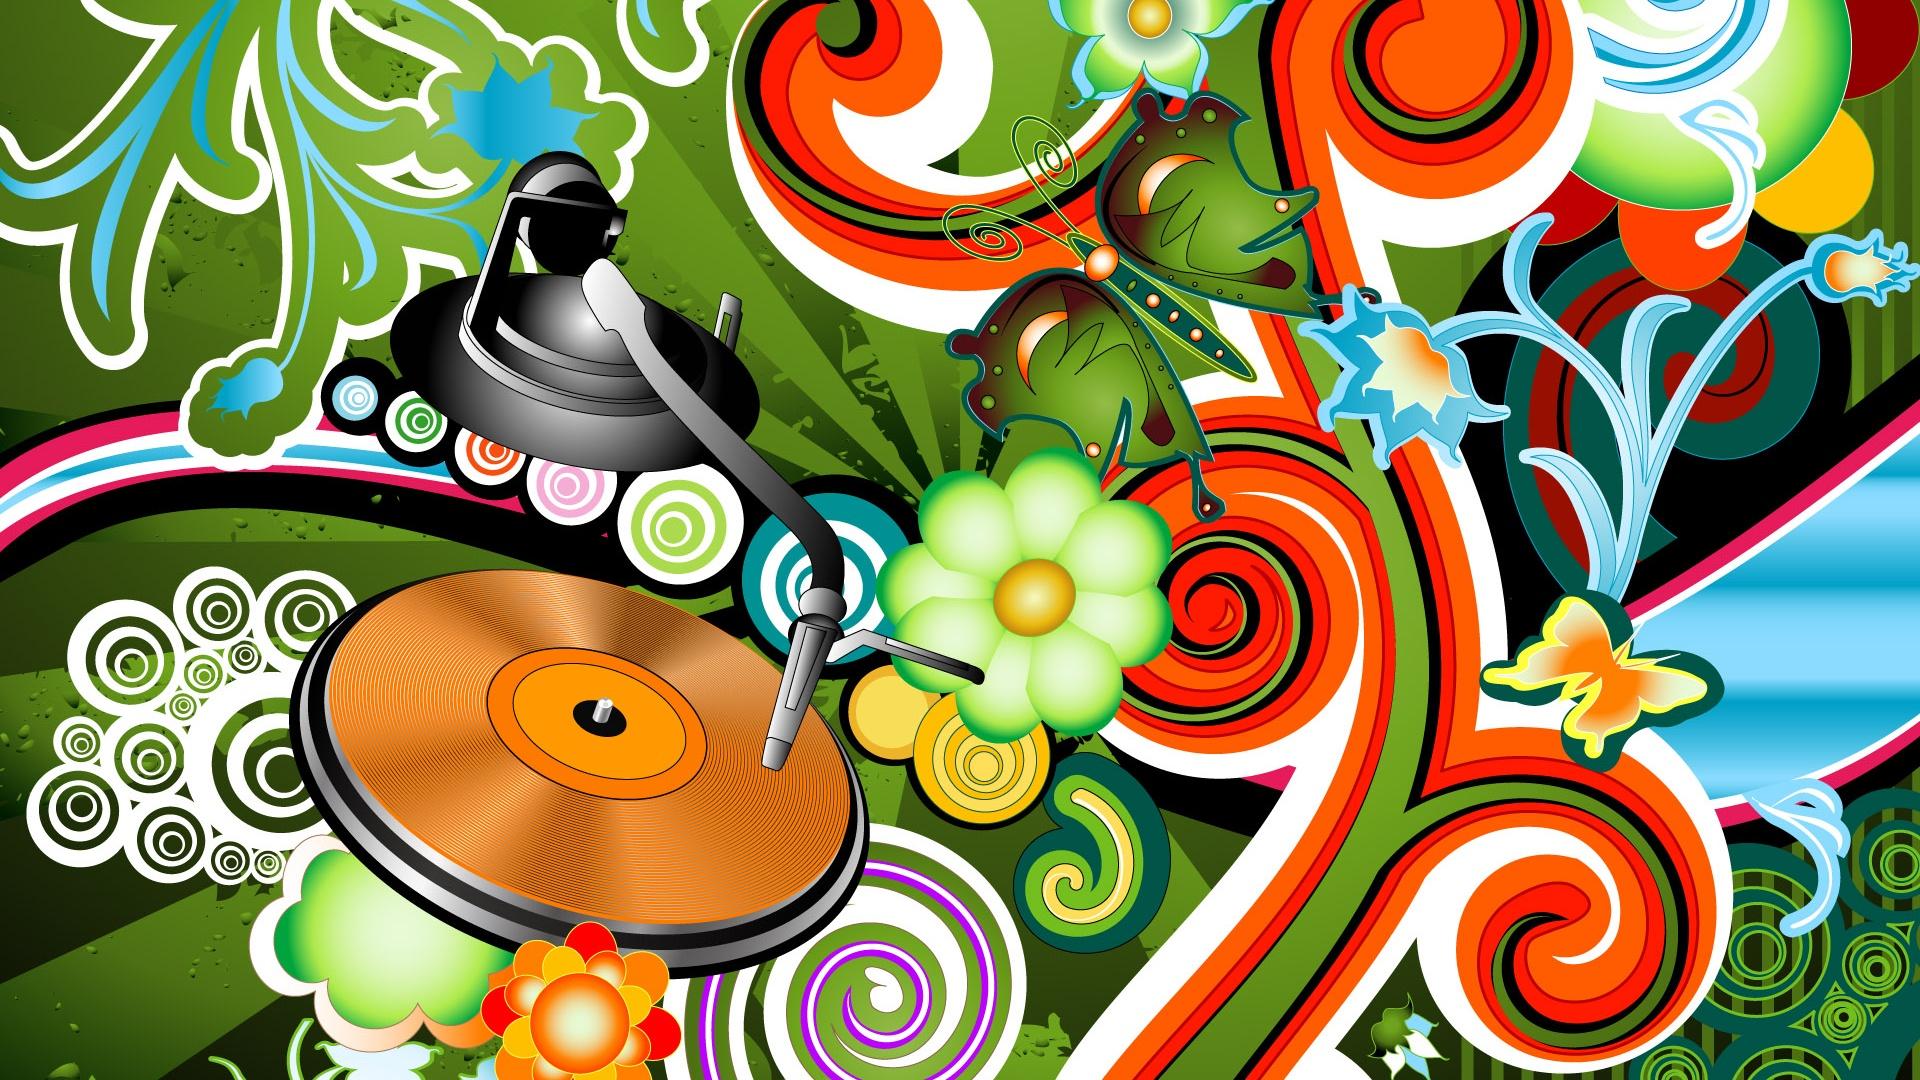 Good Wallpaper Music Spring - spring-music-preview  Image_806856.jpg